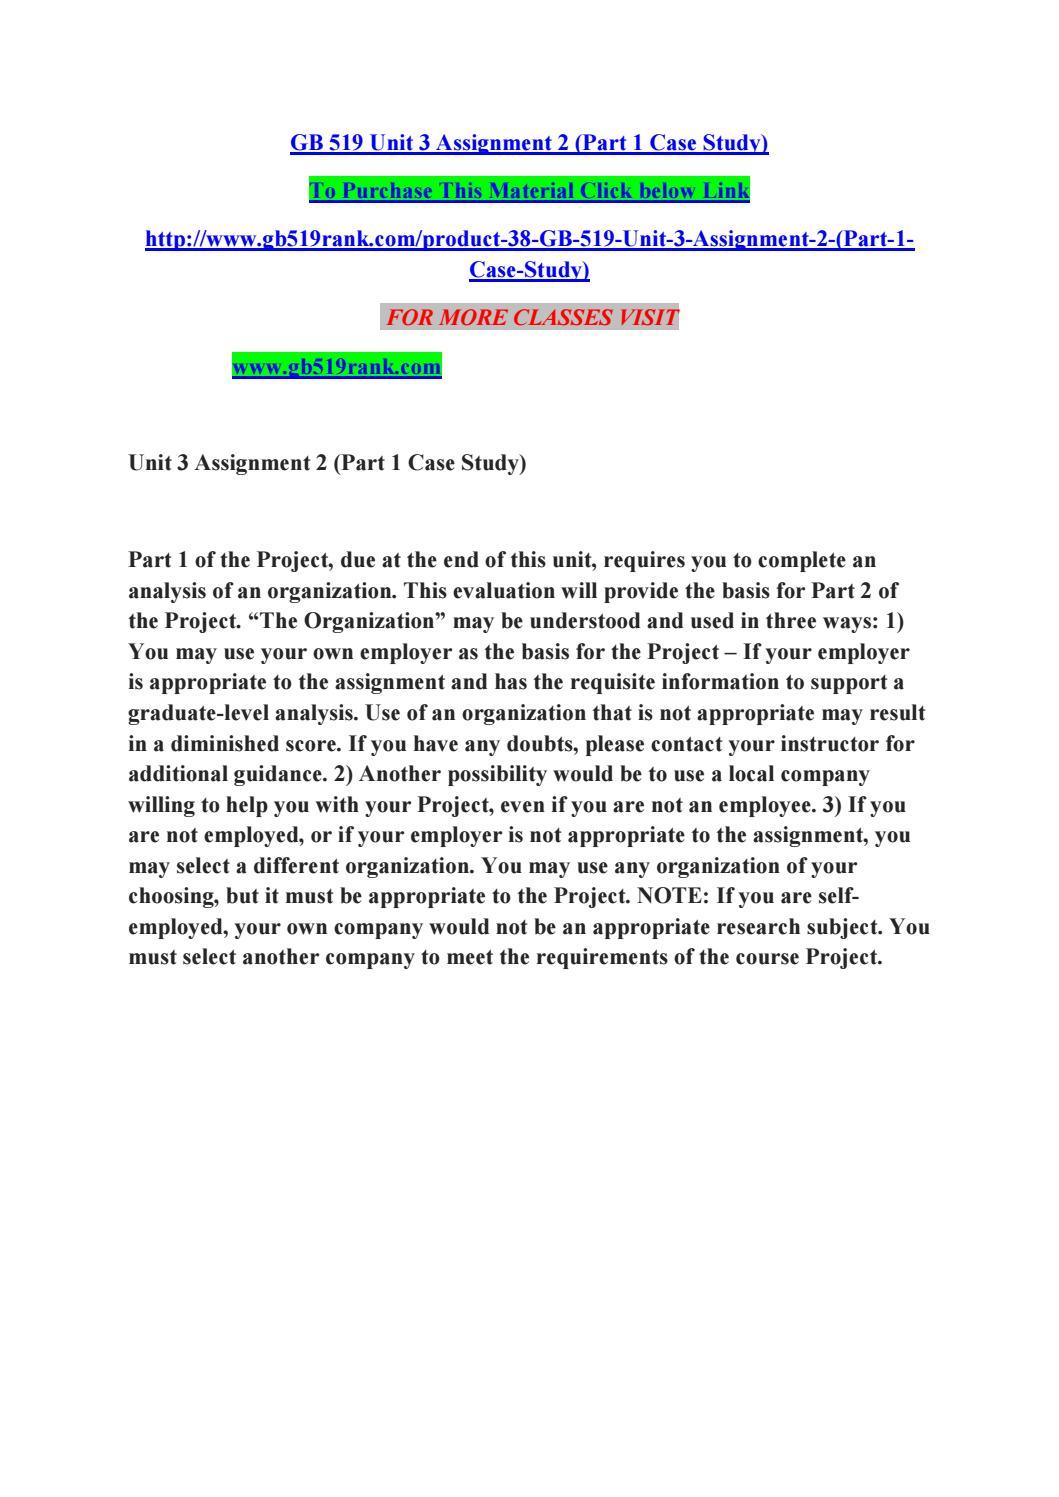 gb519 unit 3 case study